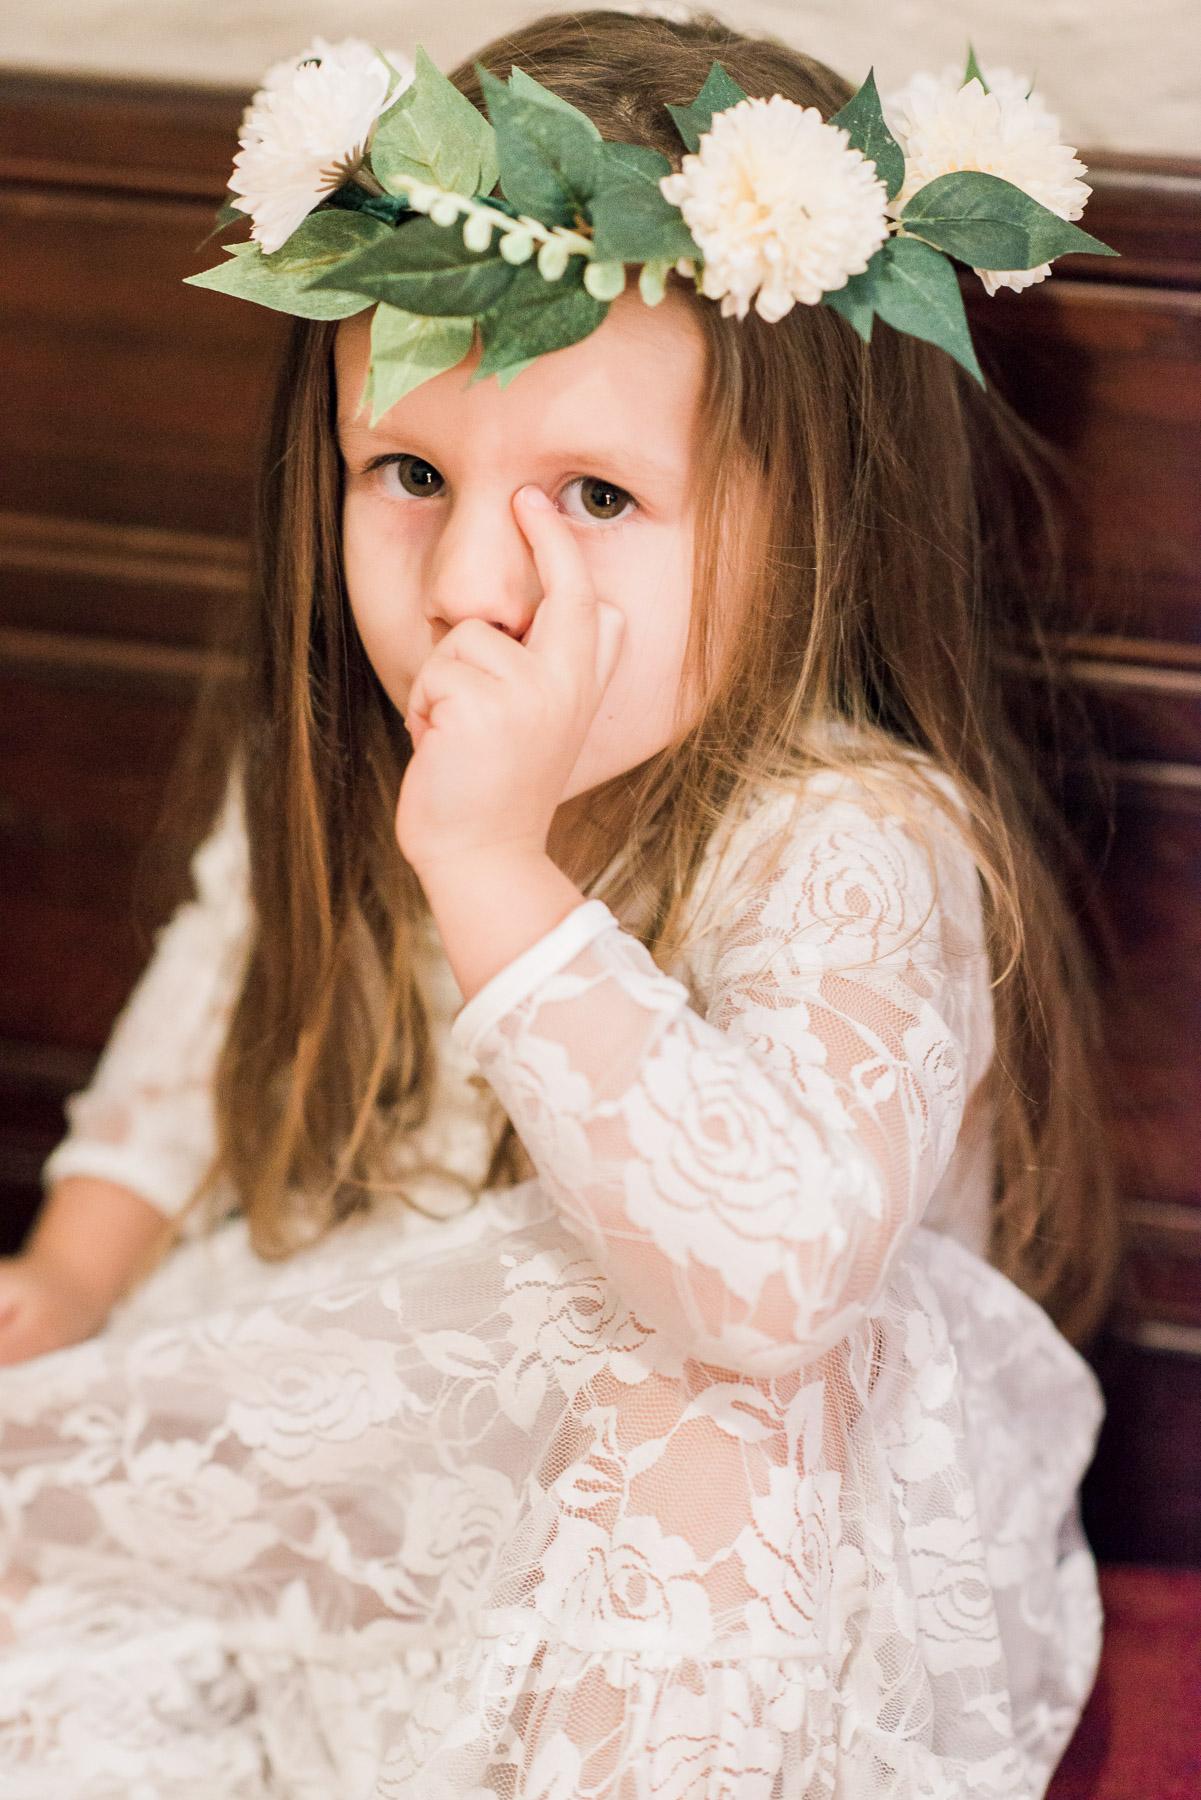 KateTaramykinStudios-Portfolio-Weddings-Rollins-1-2.jpg